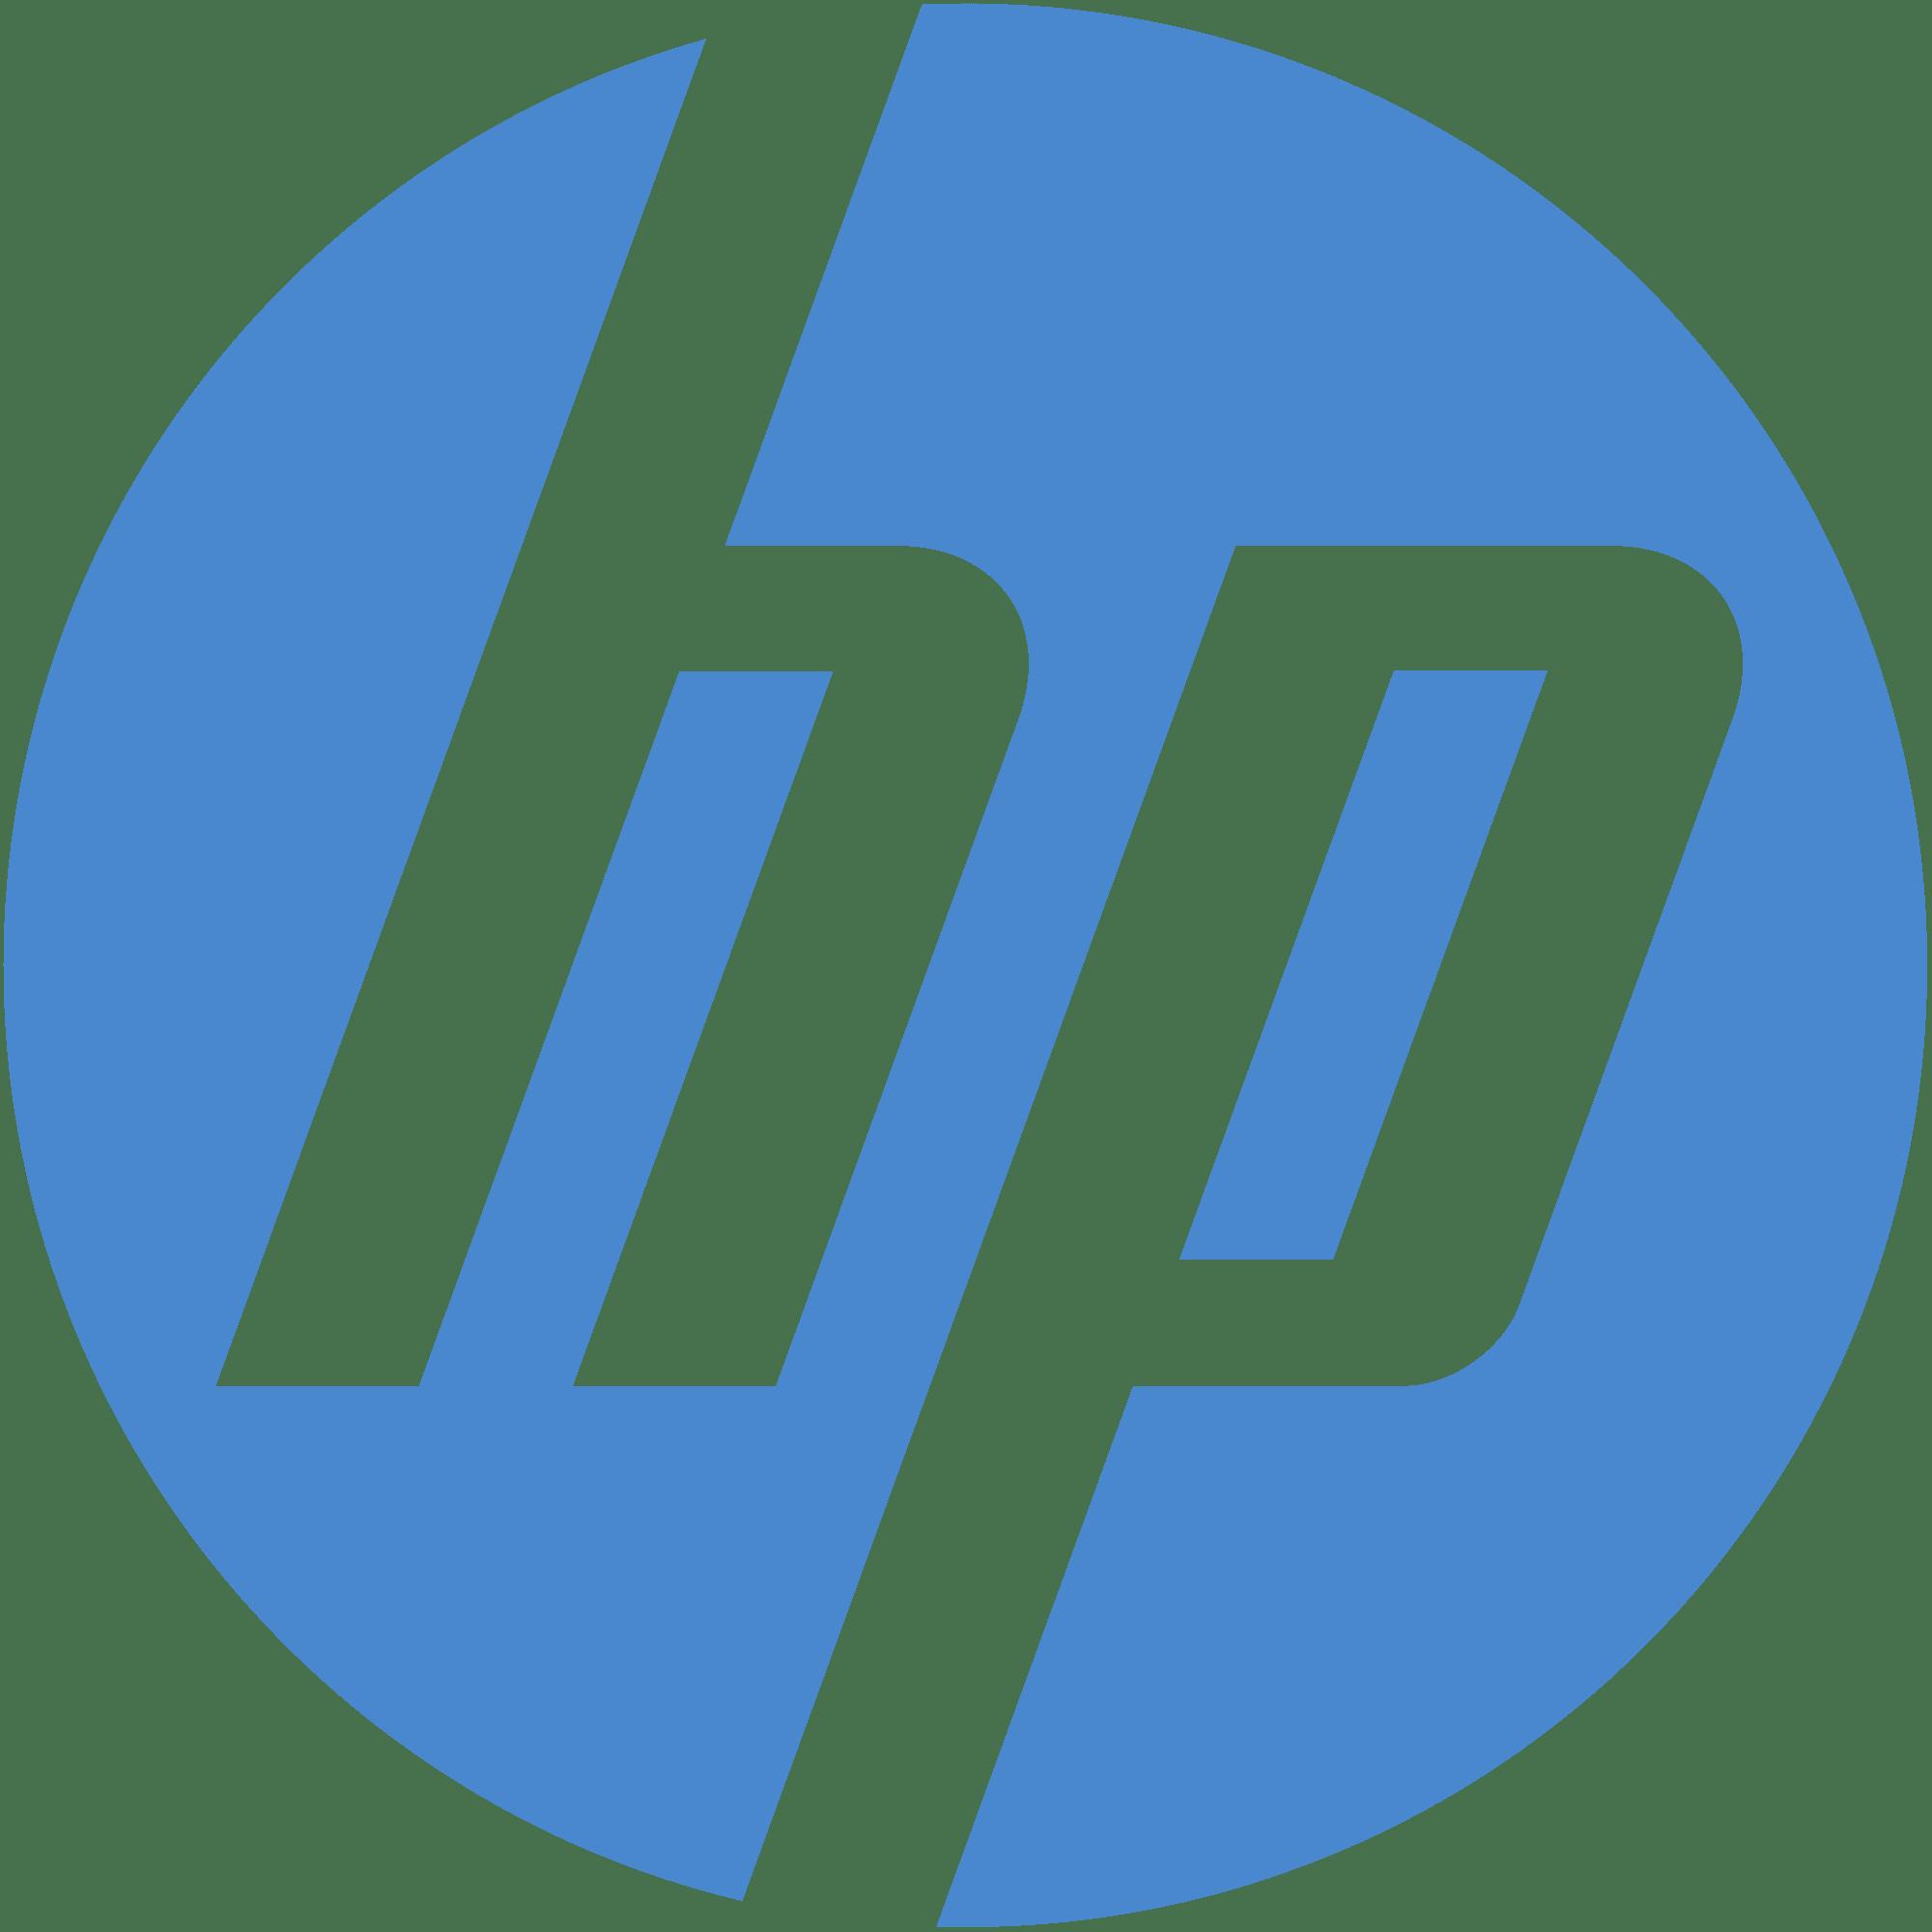 HP ENVY 6-1003tx Notebook PC drivers